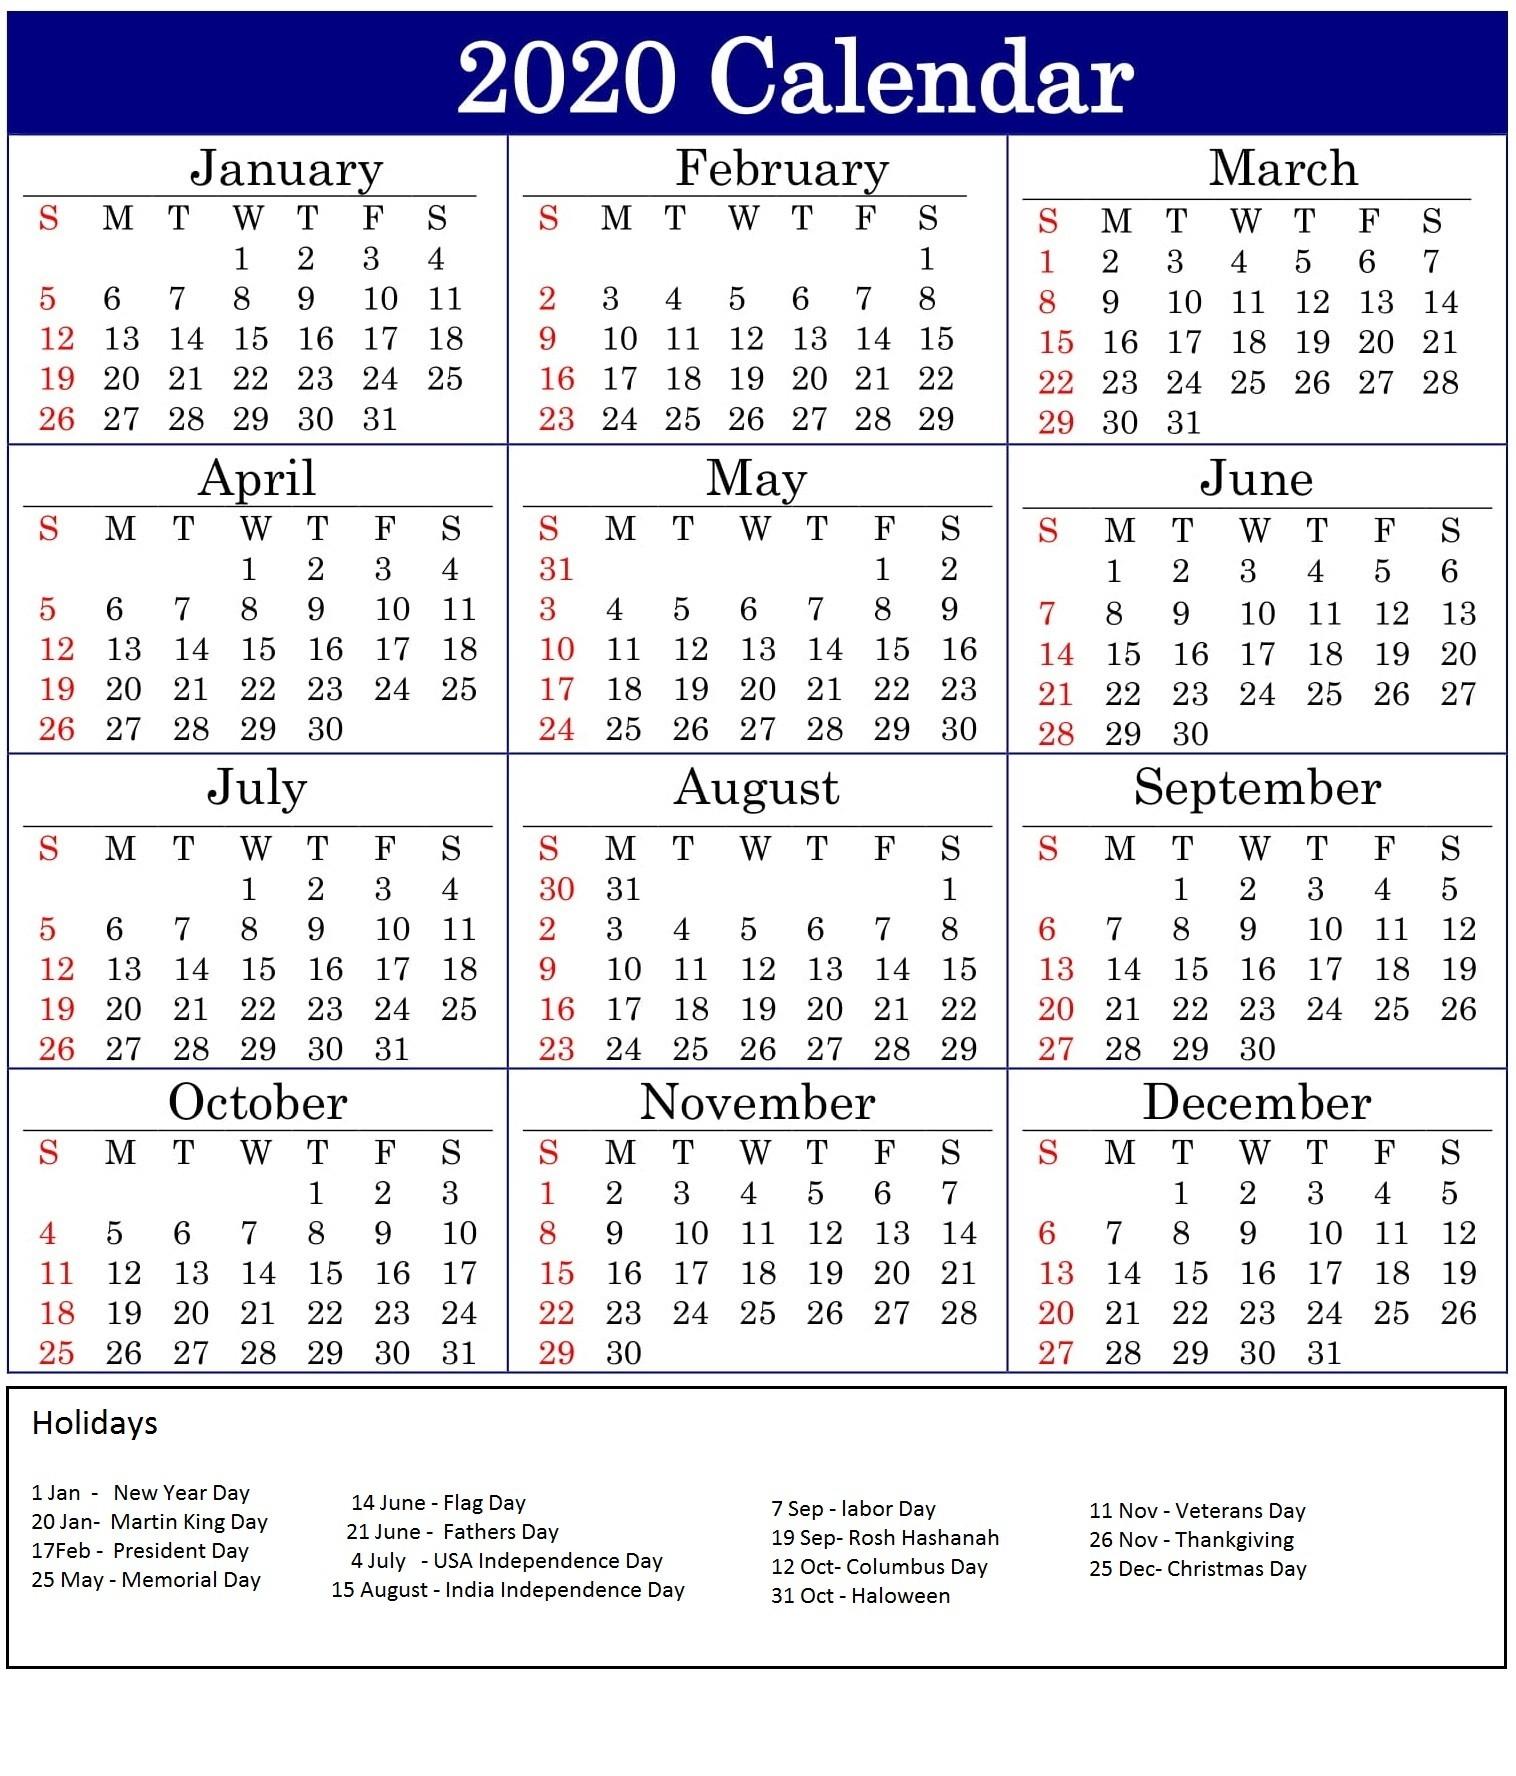 Printable 2020 Calendar With American Holidays - Latest  2020 Calendar With Holidays Printable One Page